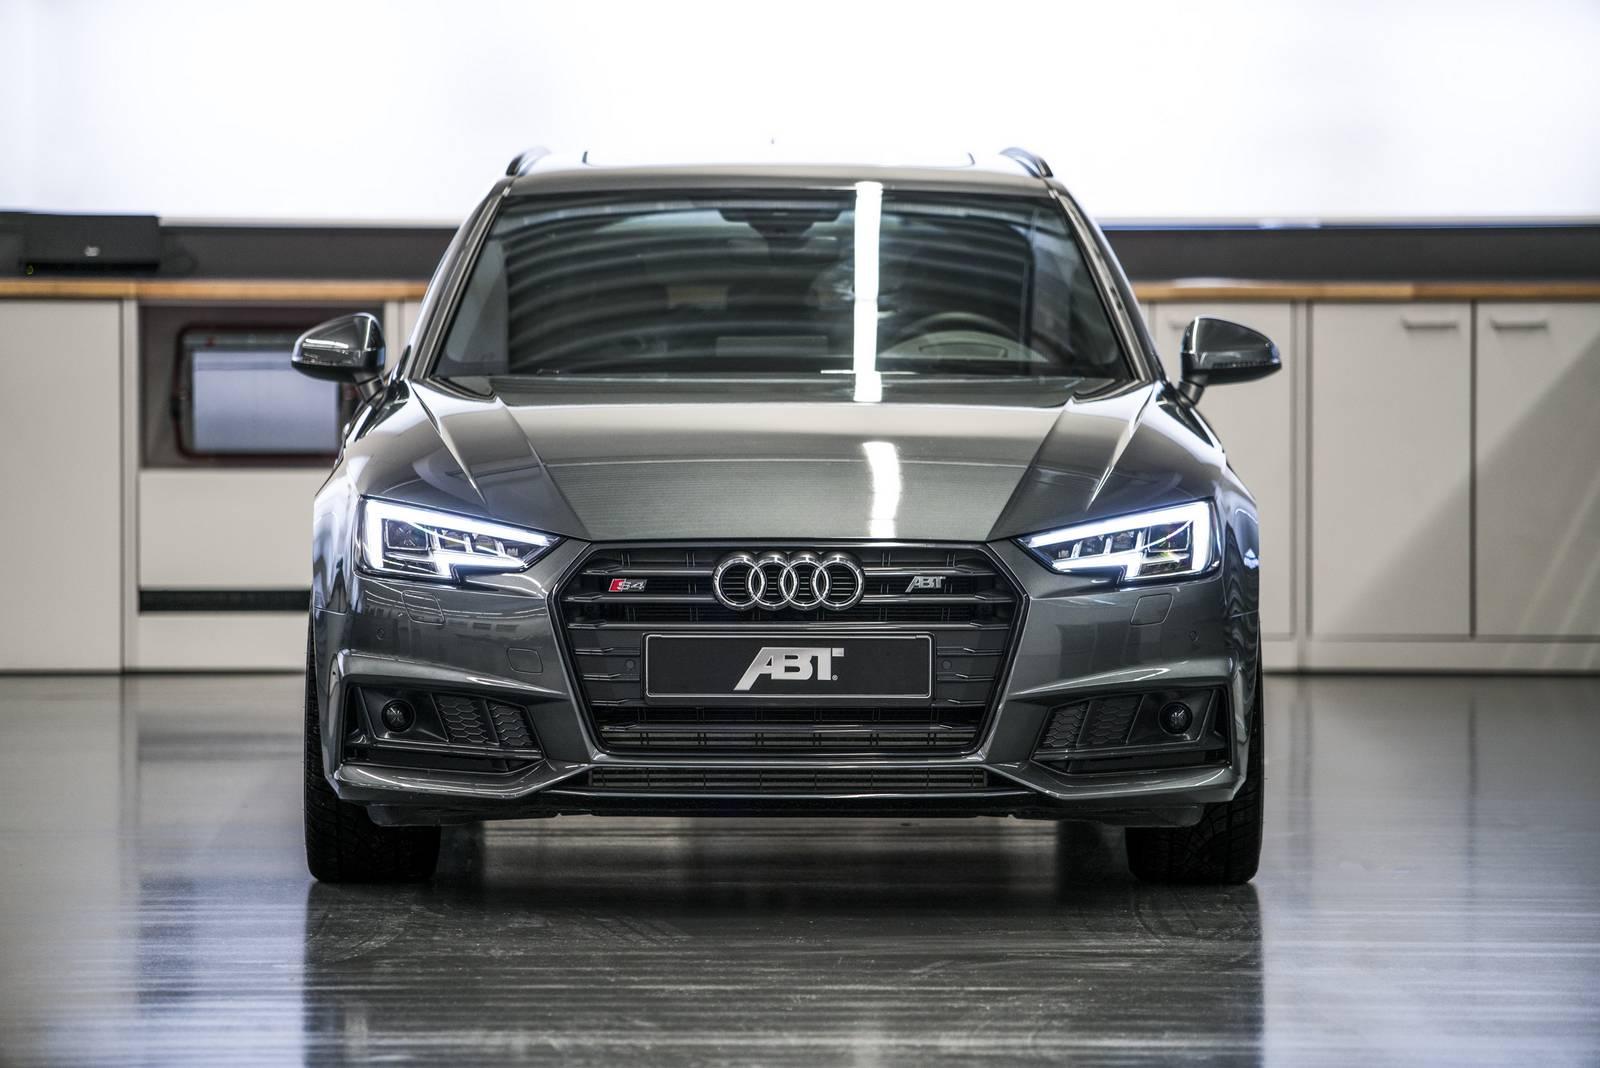 Official: ABT Audi S4 Avant with 425hp - GTspirit